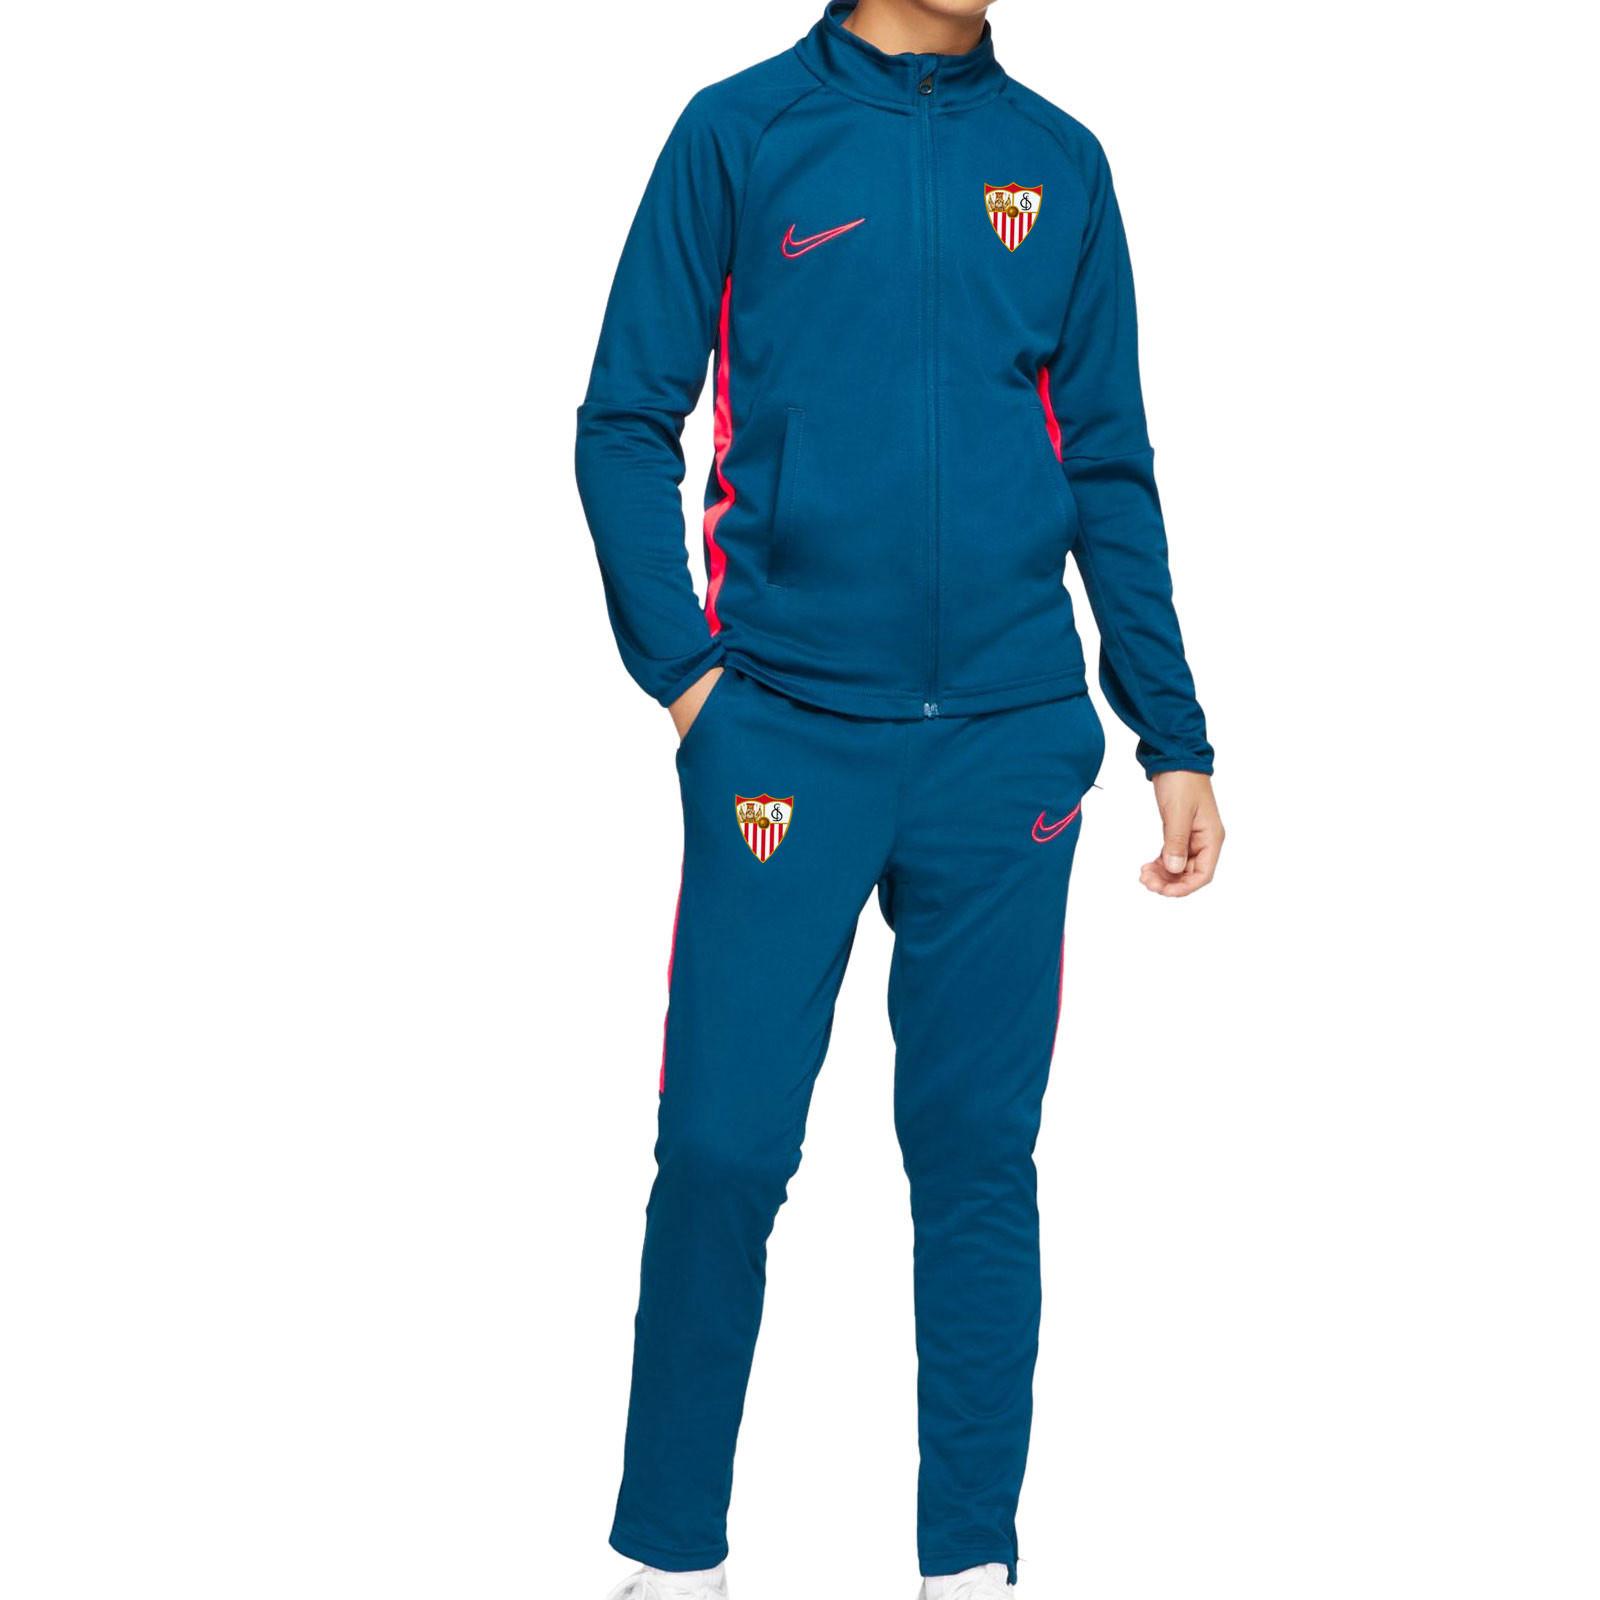 lavar Dinámica Oblongo  Chándal Nike Sevilla niño 2020 2021 | futbolmaniaKids